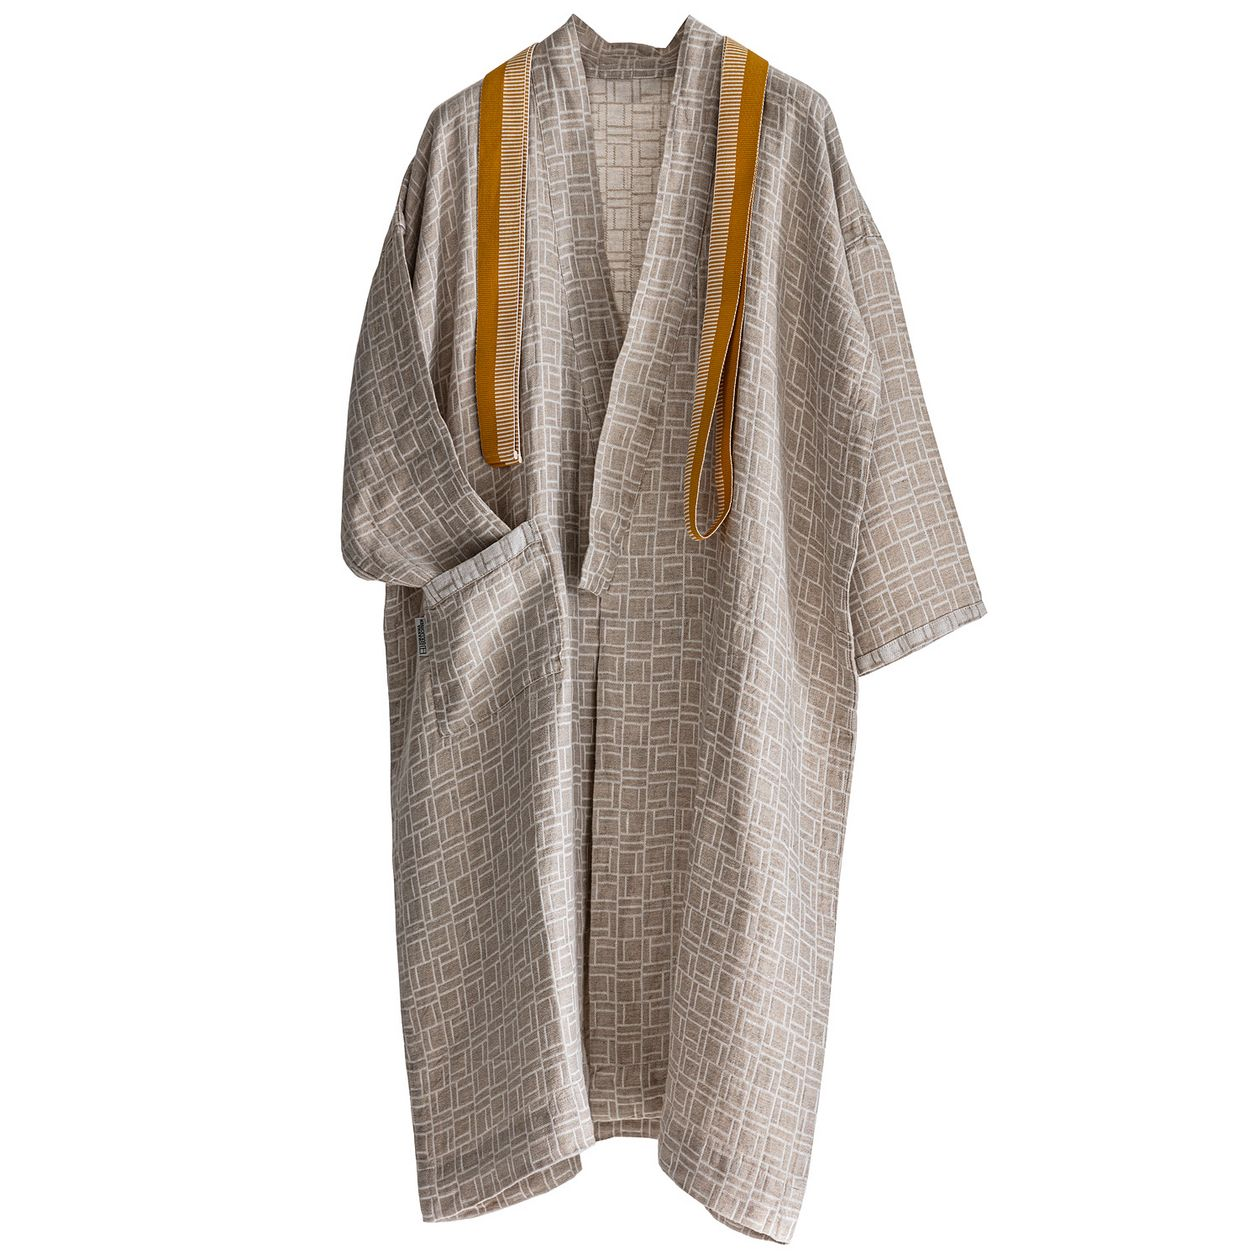 Johanna Gullichsen Pure bathrobe, medium flax